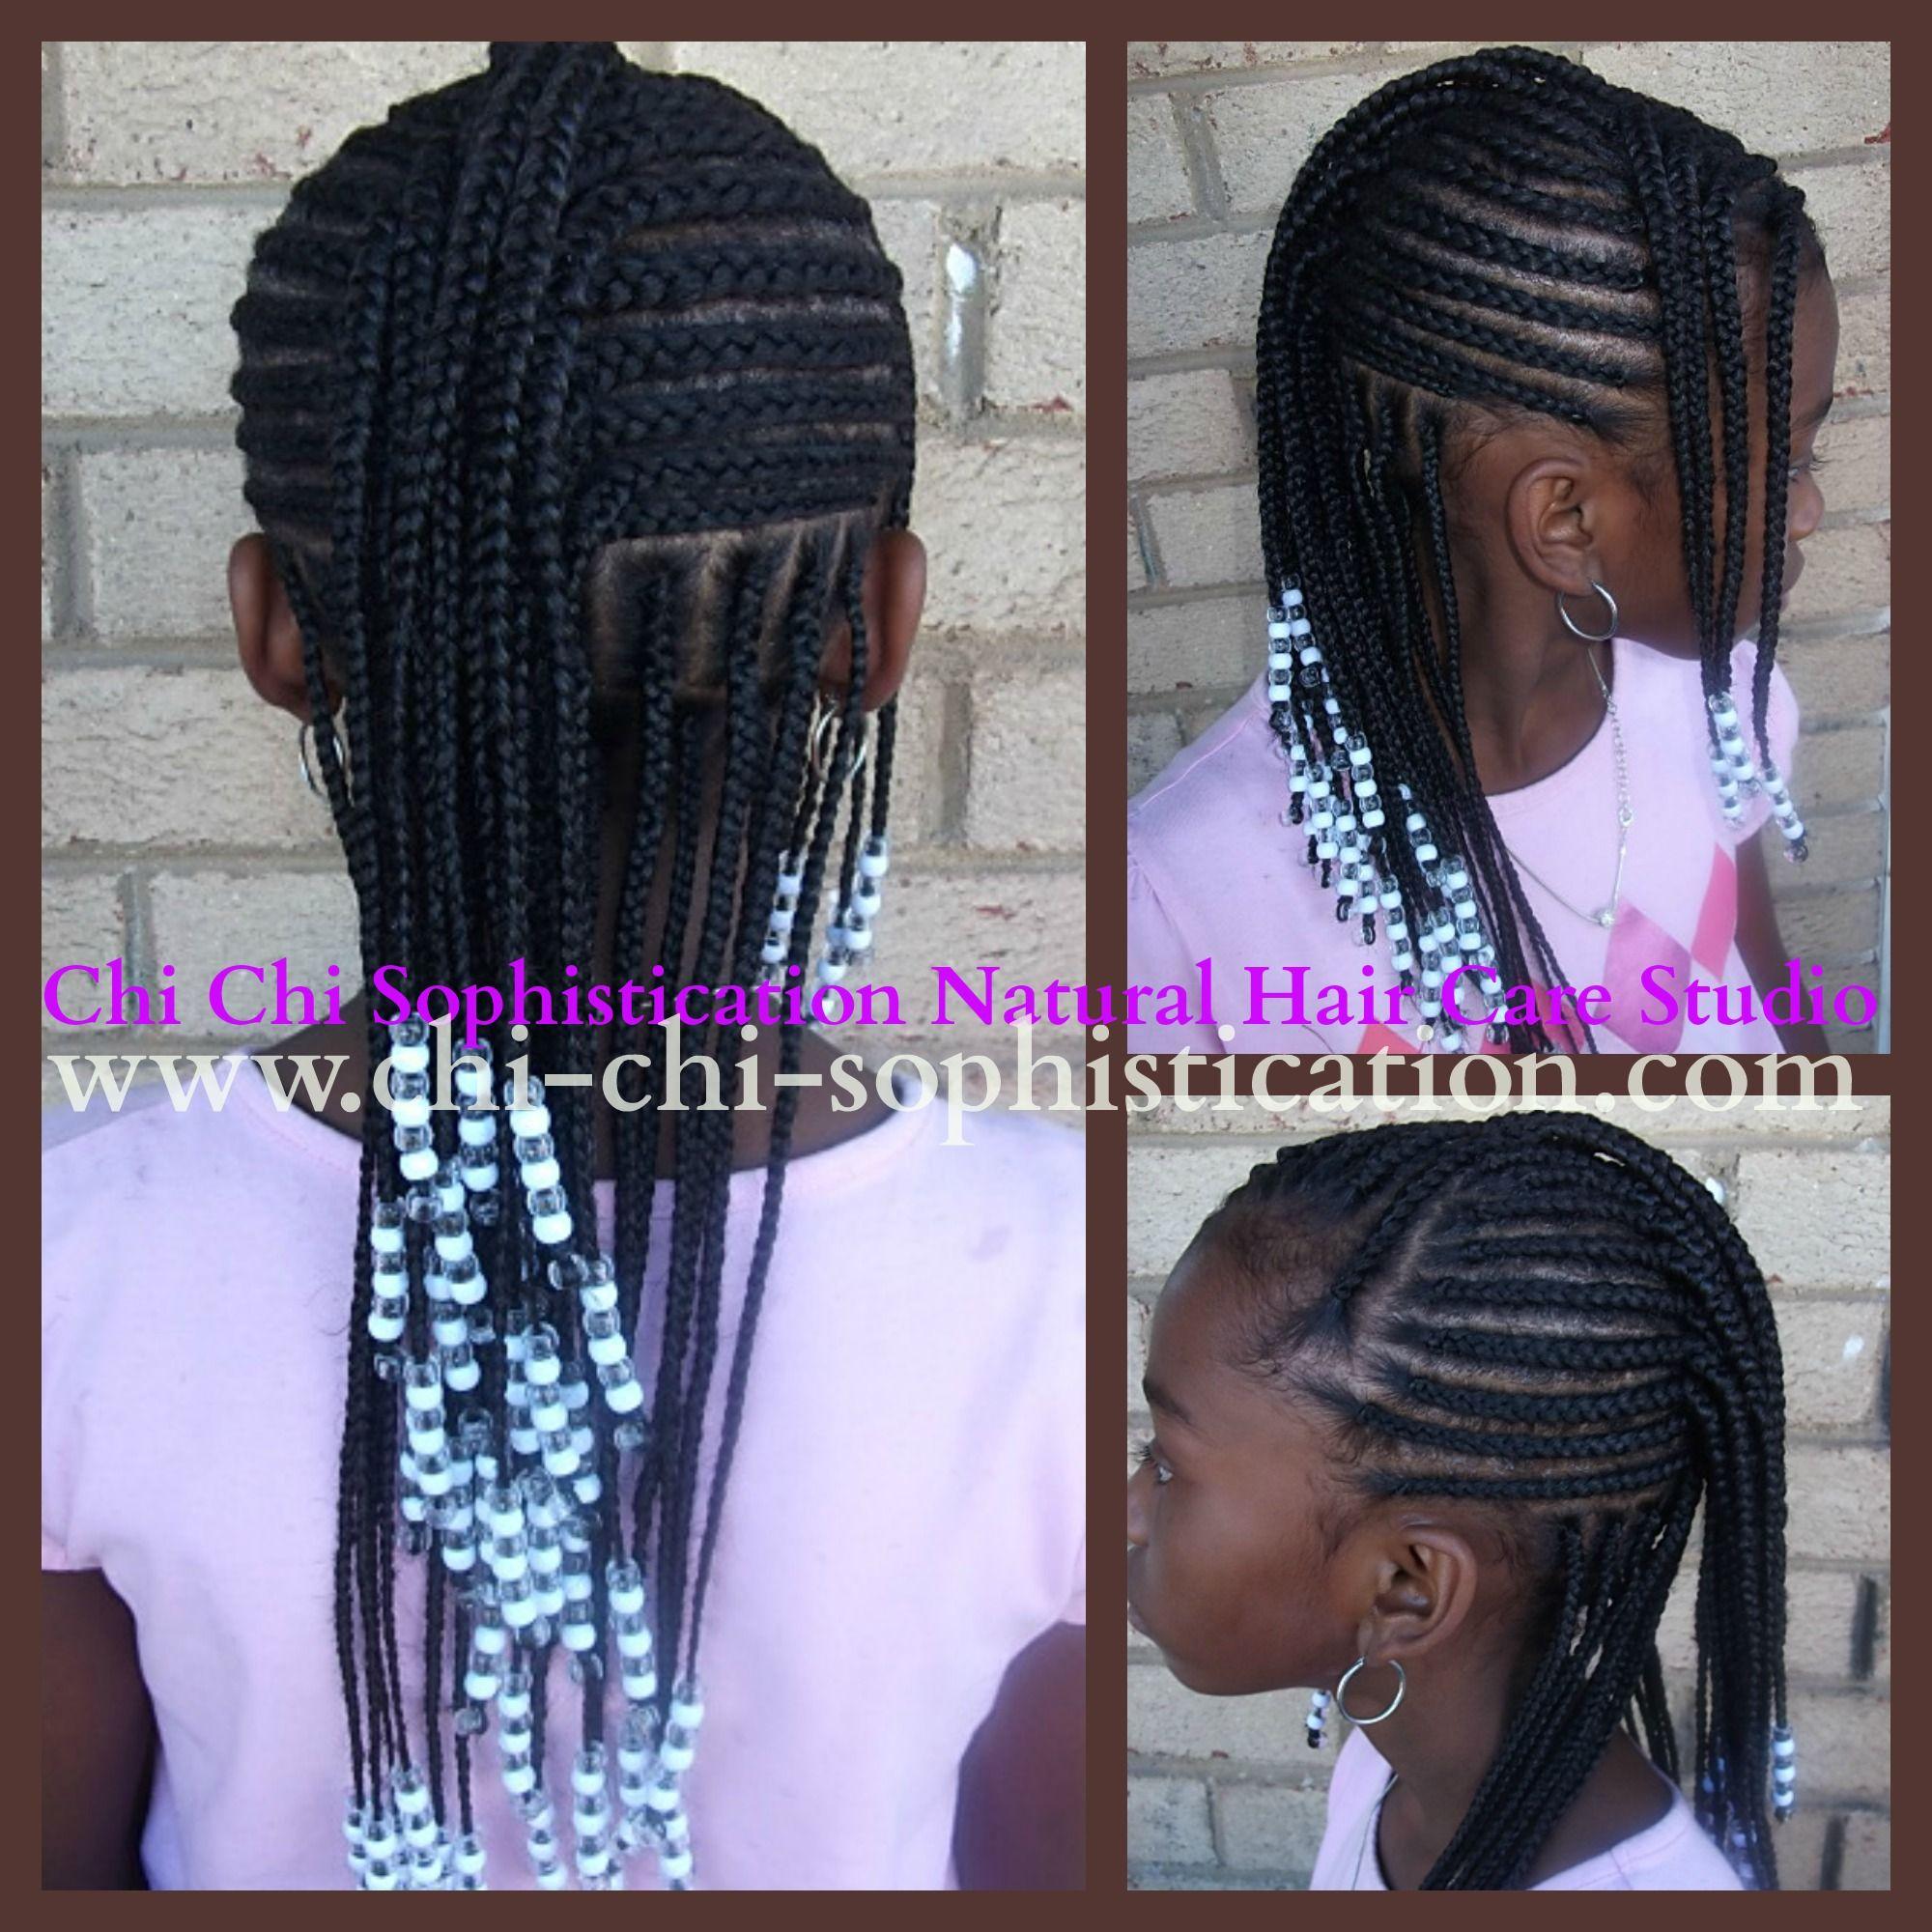 Cornrows Beads Using Extensions Kanekalon Hair For Added Length Hair Styles Kids Hairstyles Little Girl Braids